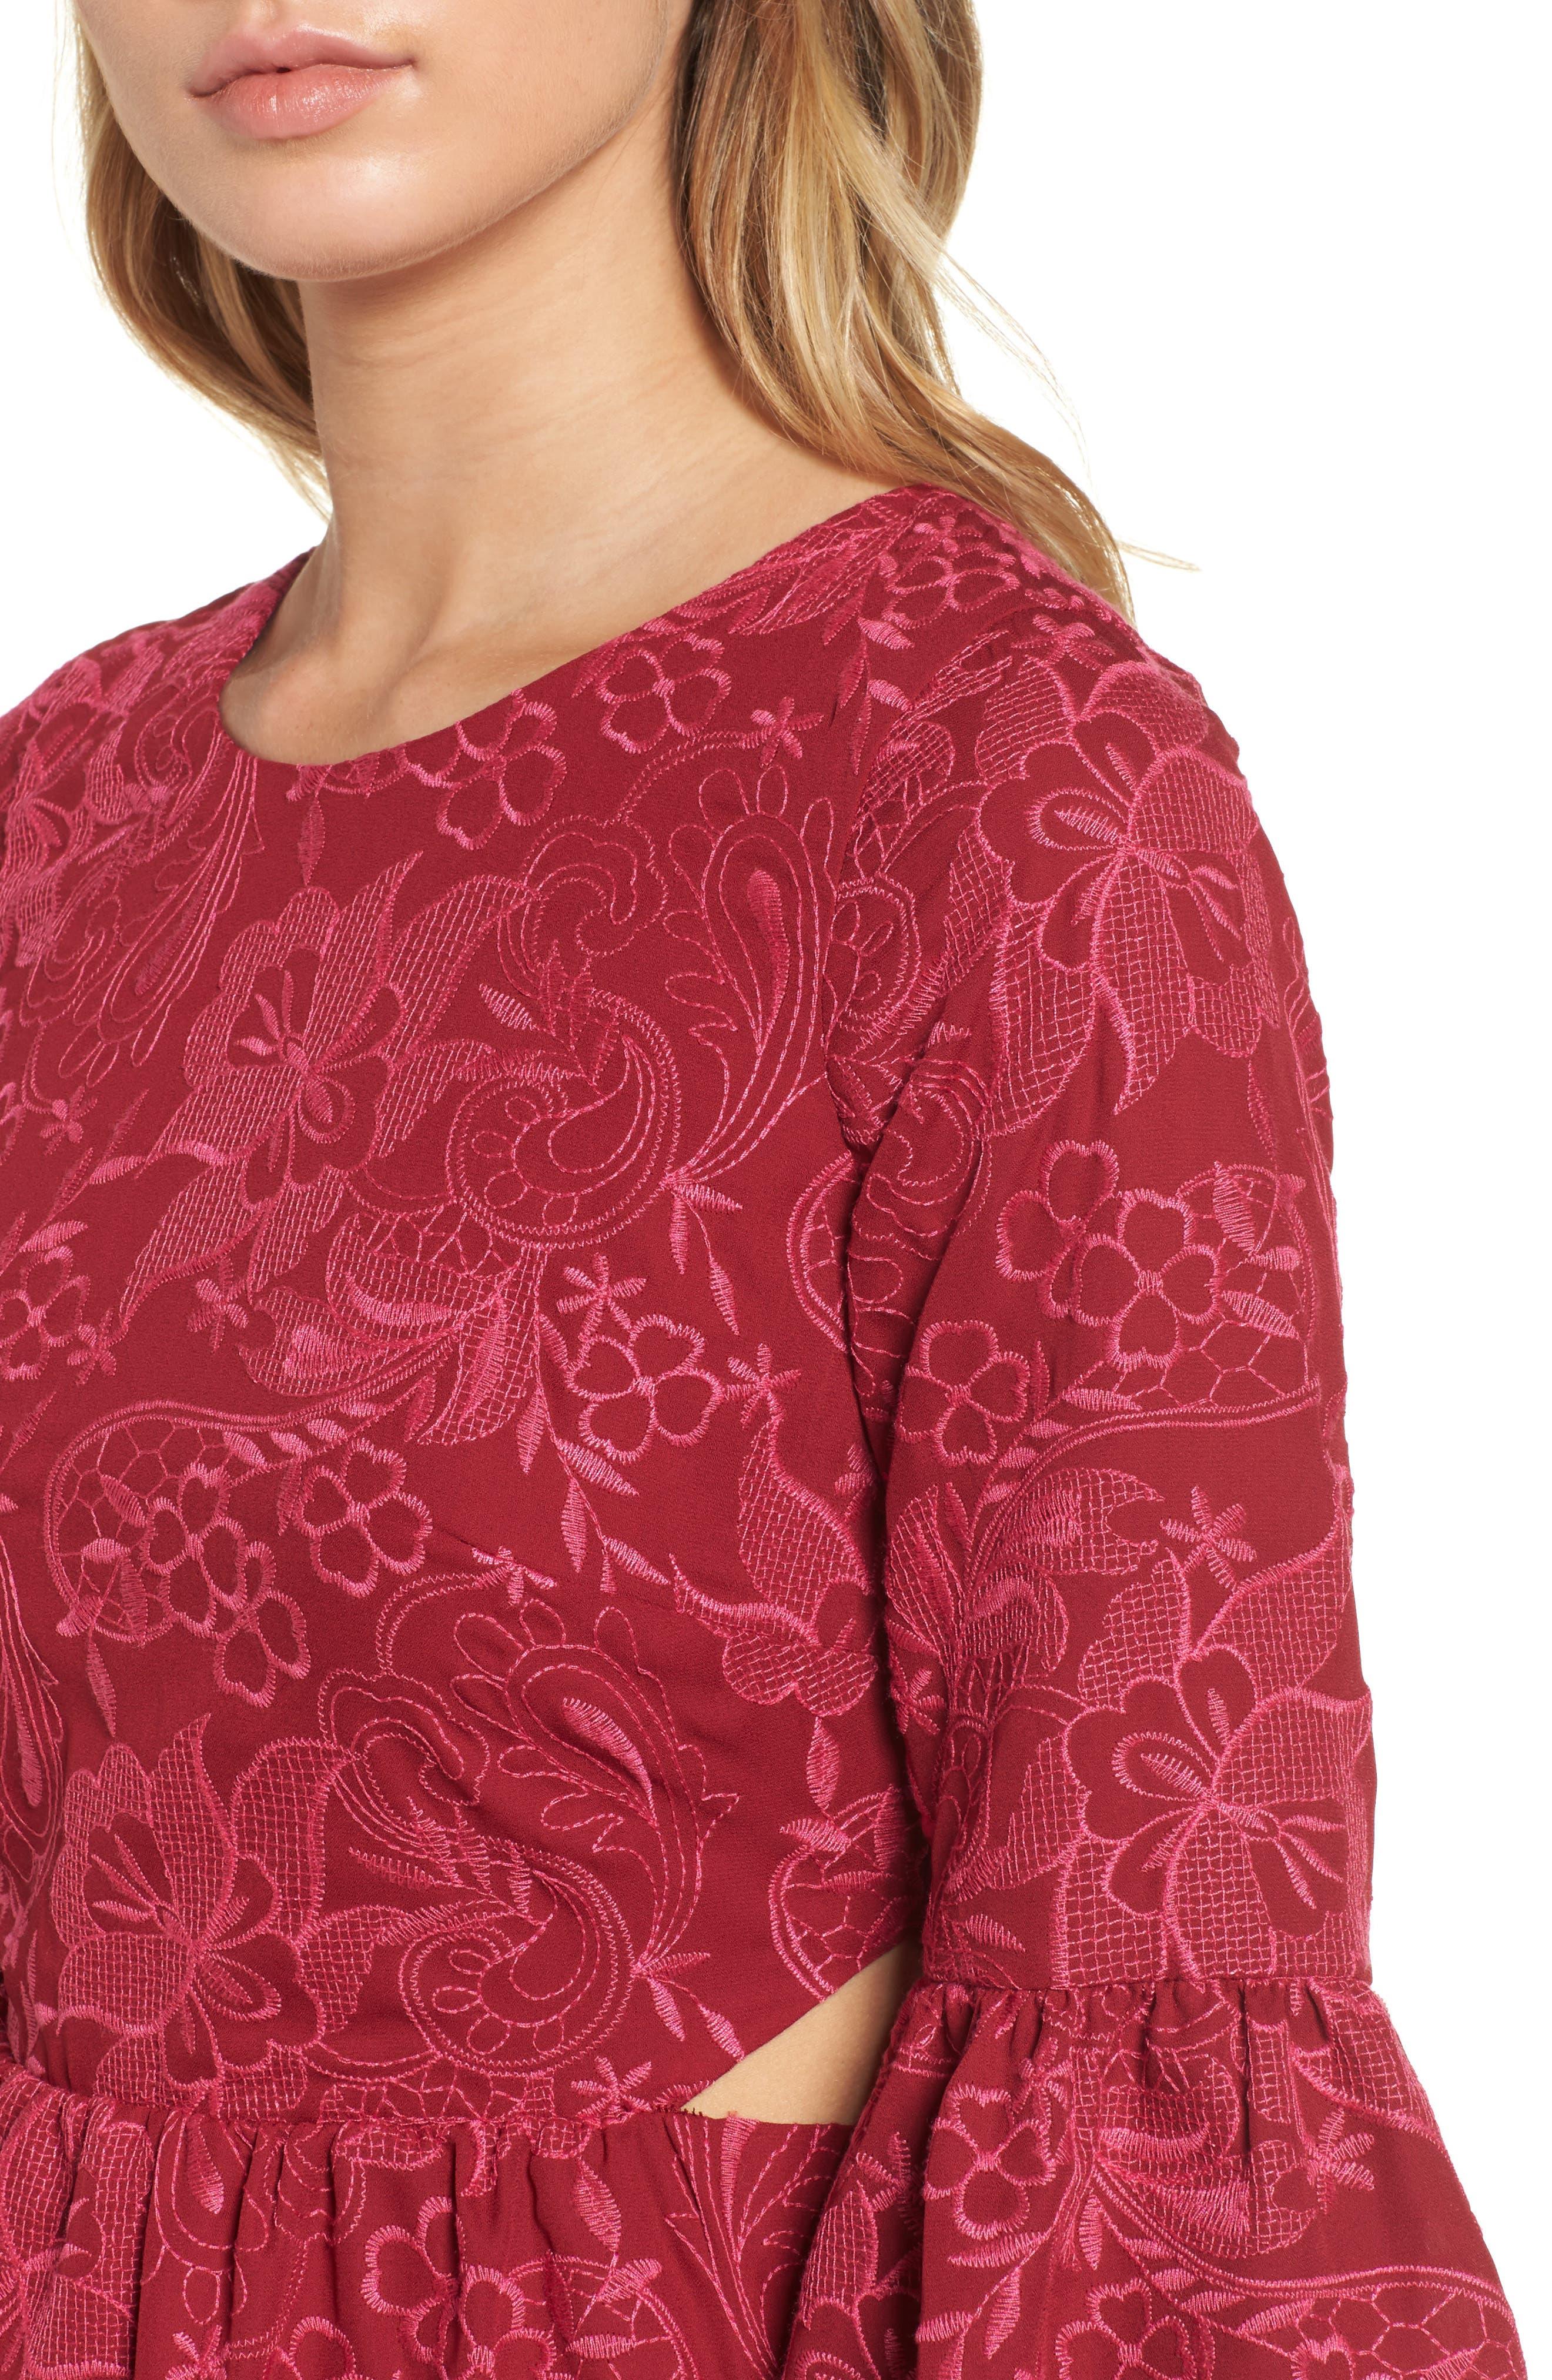 Serafina Bell Sleeve Dress,                             Alternate thumbnail 4, color,                             Shiraz